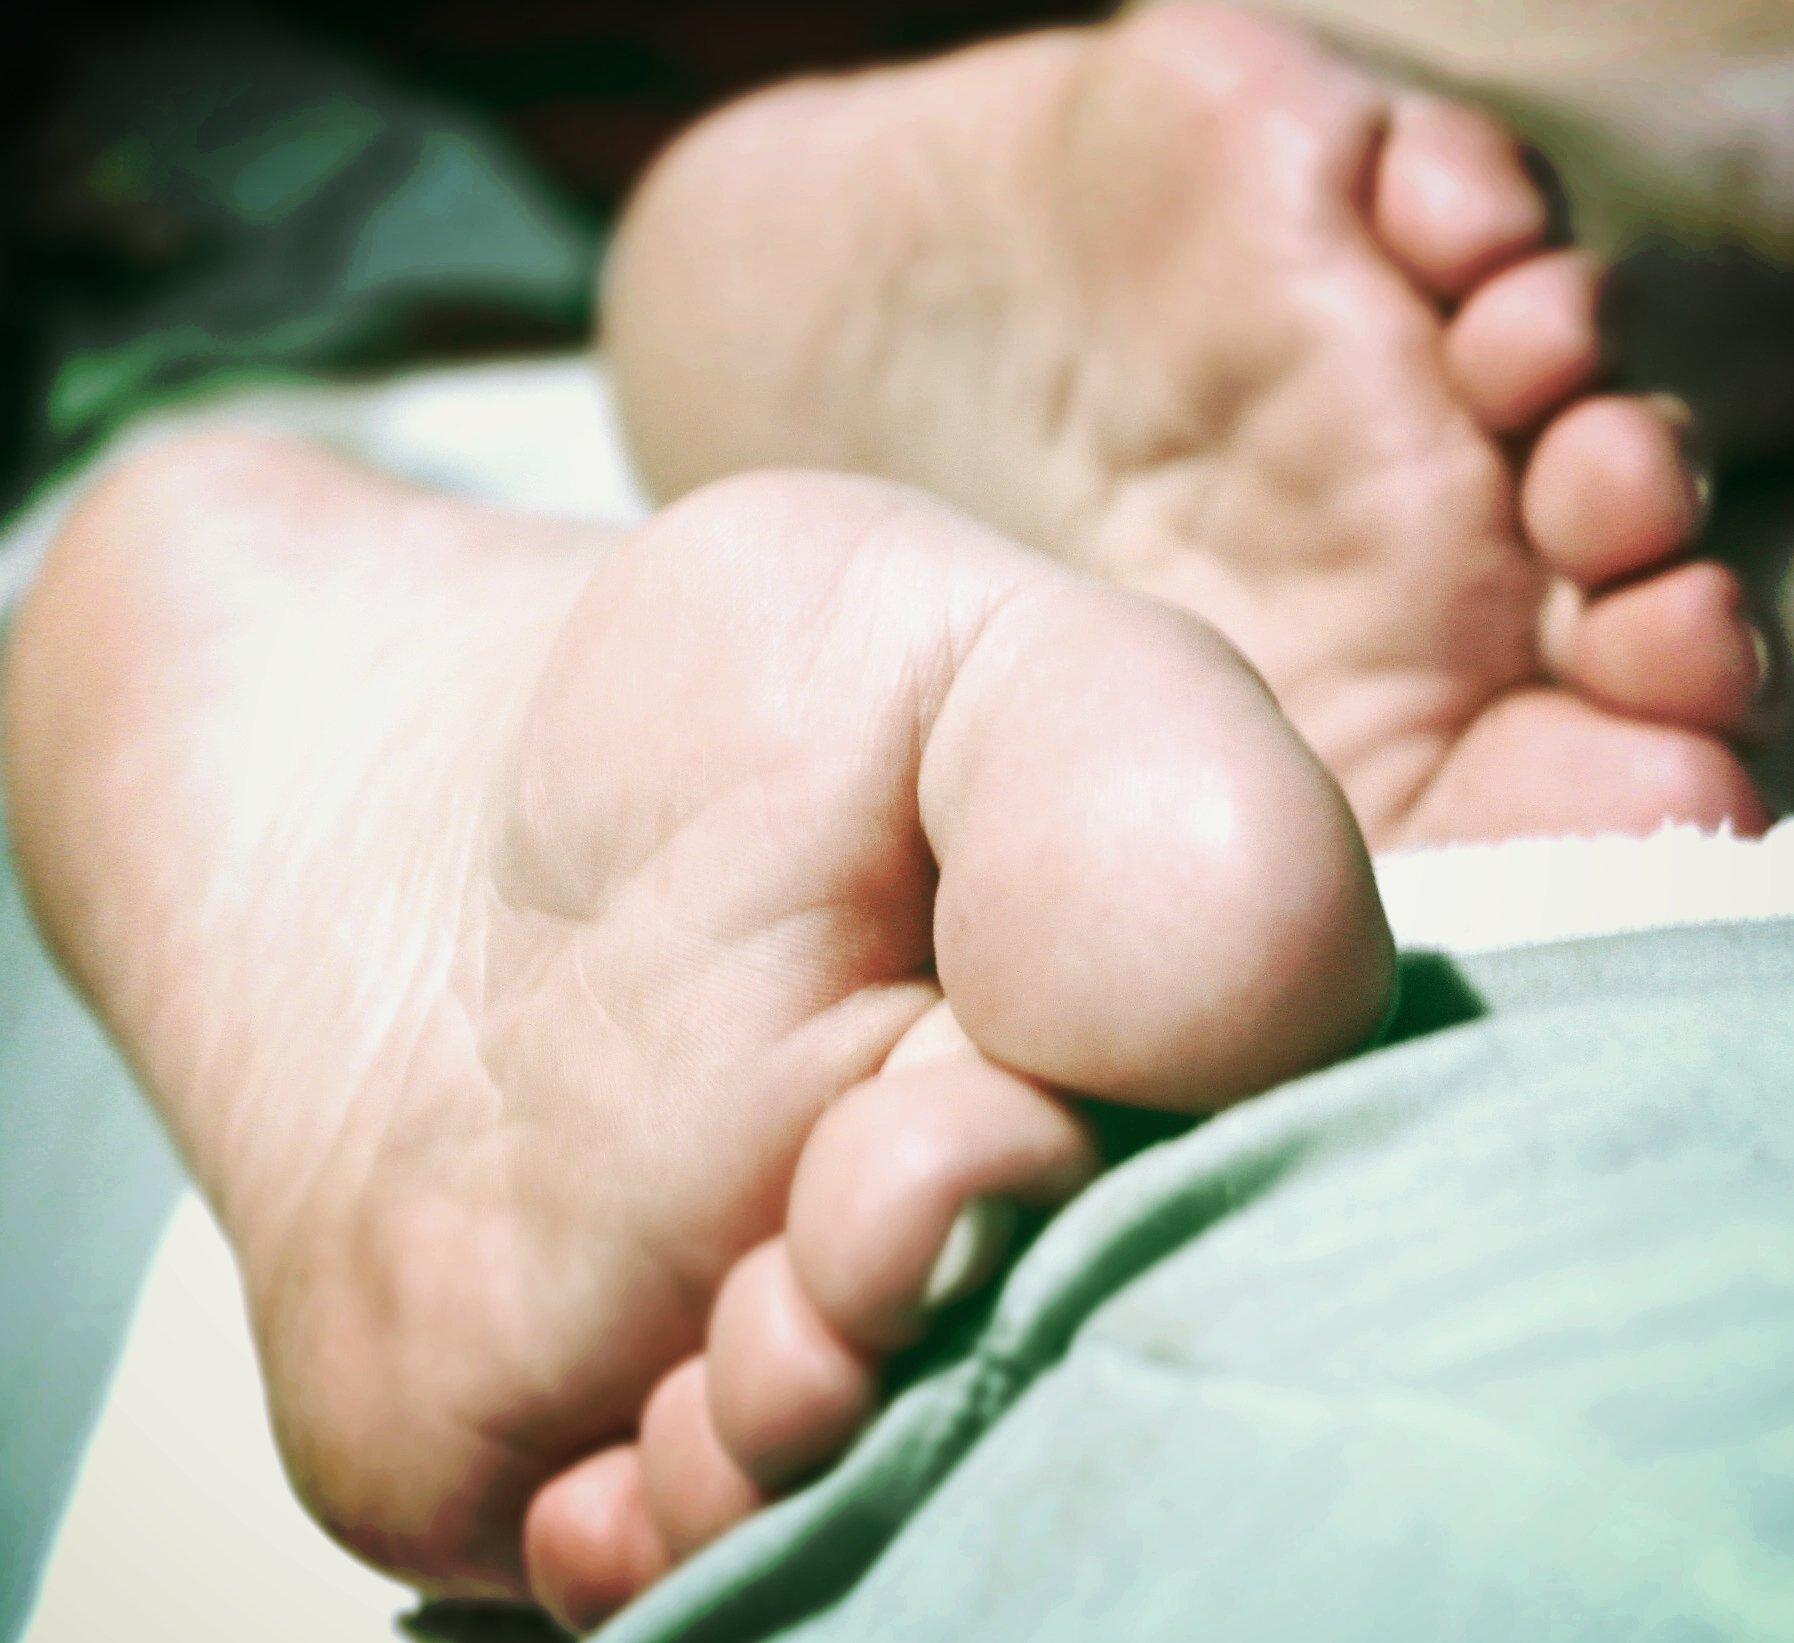 Pieds qui dorment. | Photo : Flickr